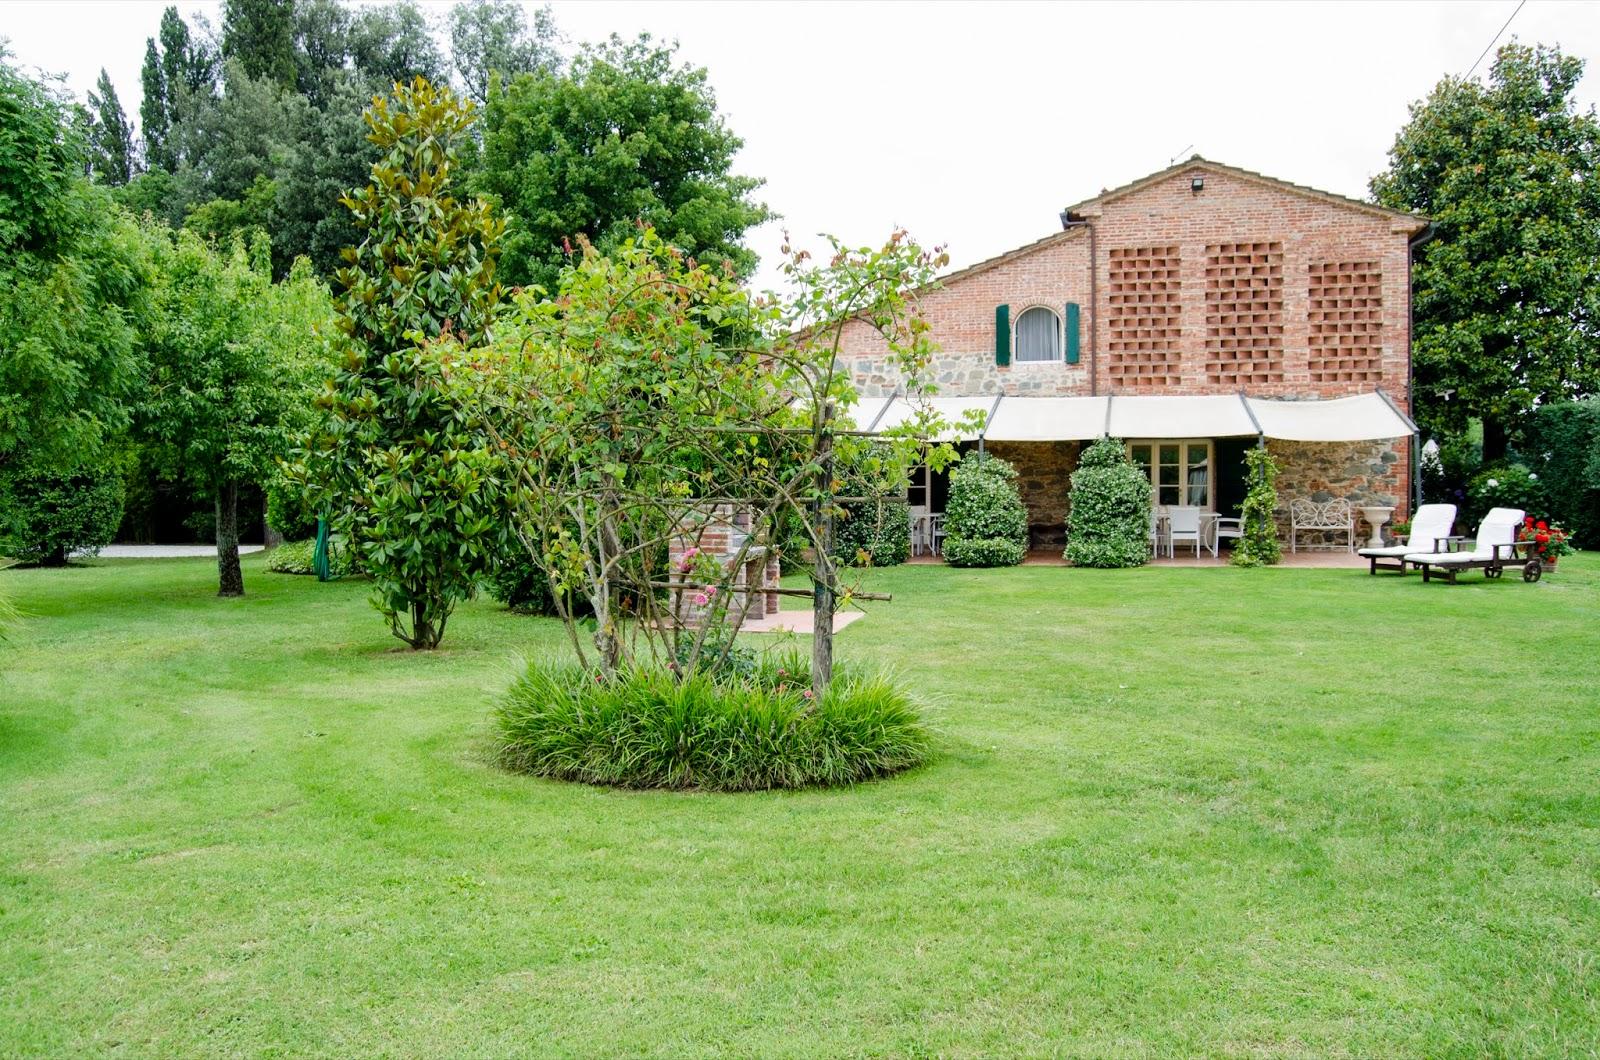 Villa Cerbaie_Castelfranco di Sotto_1